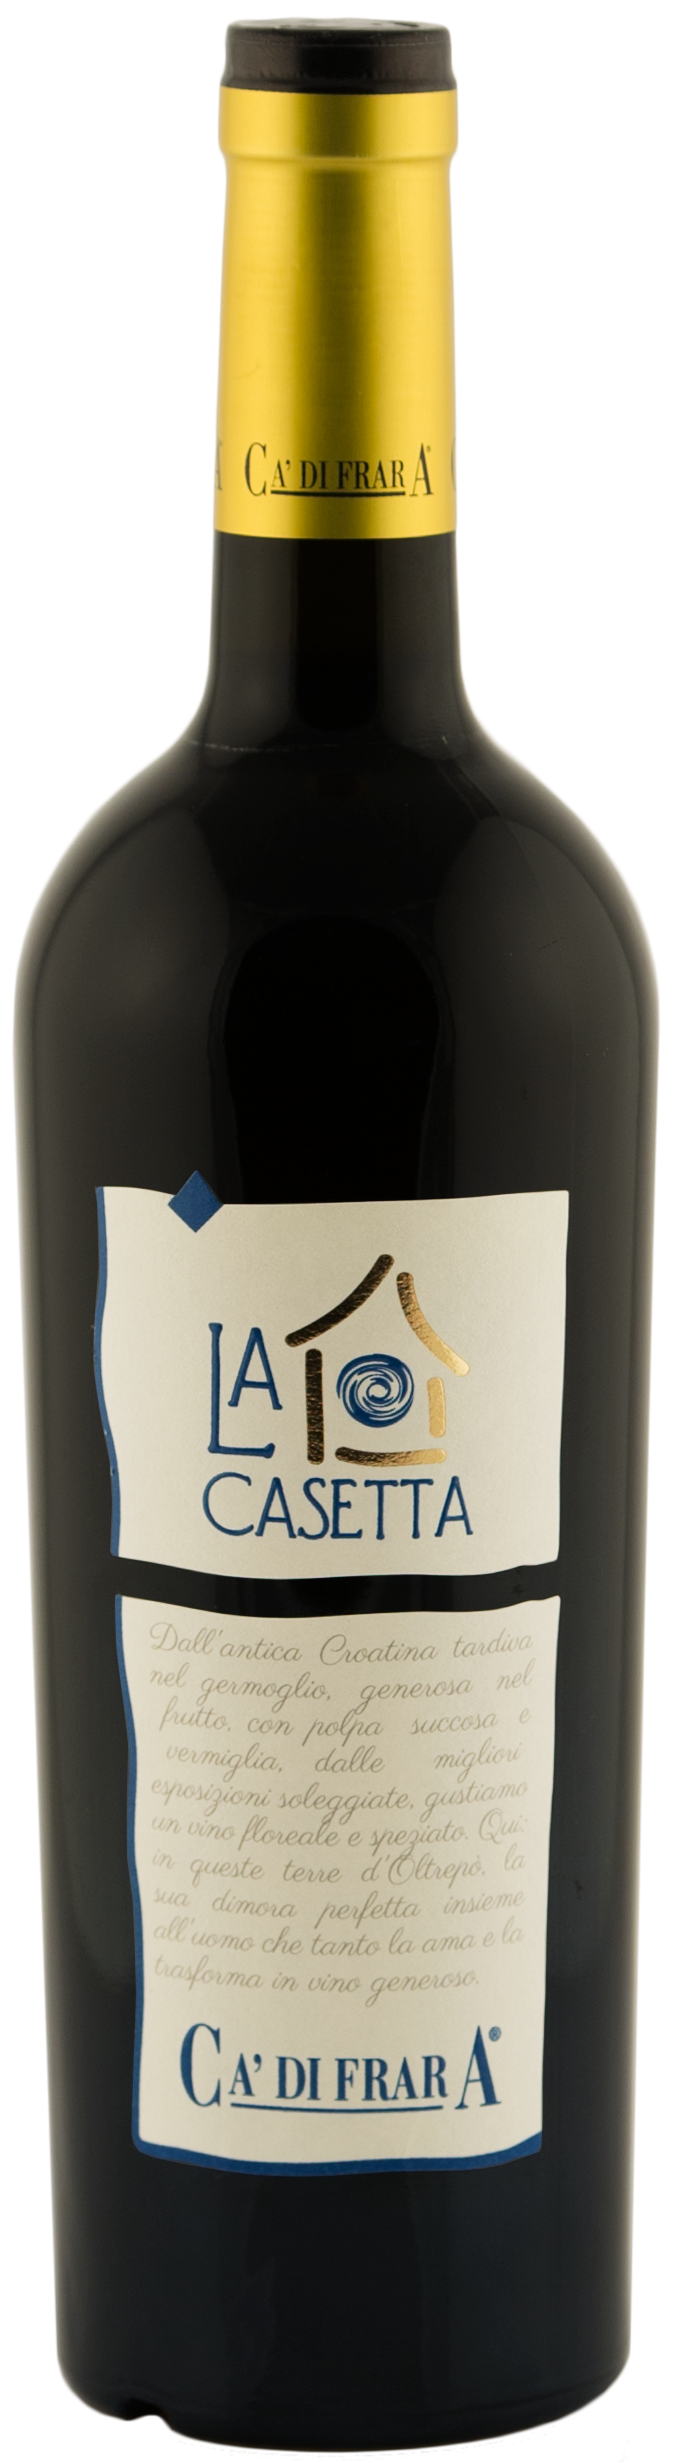 La Casetta Rossa 2014 DOP